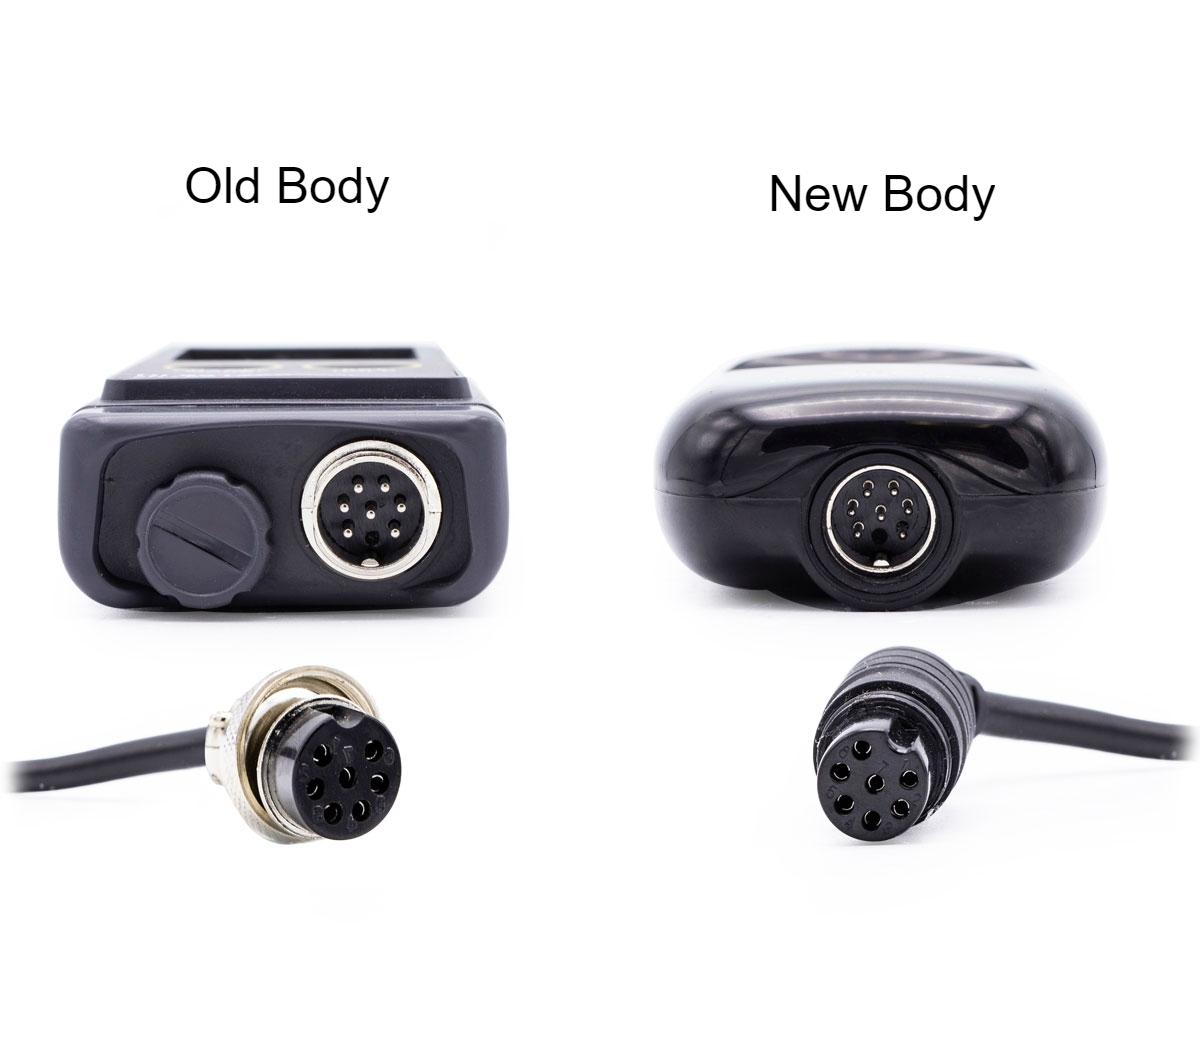 99-connectorsblack-new-vs-old